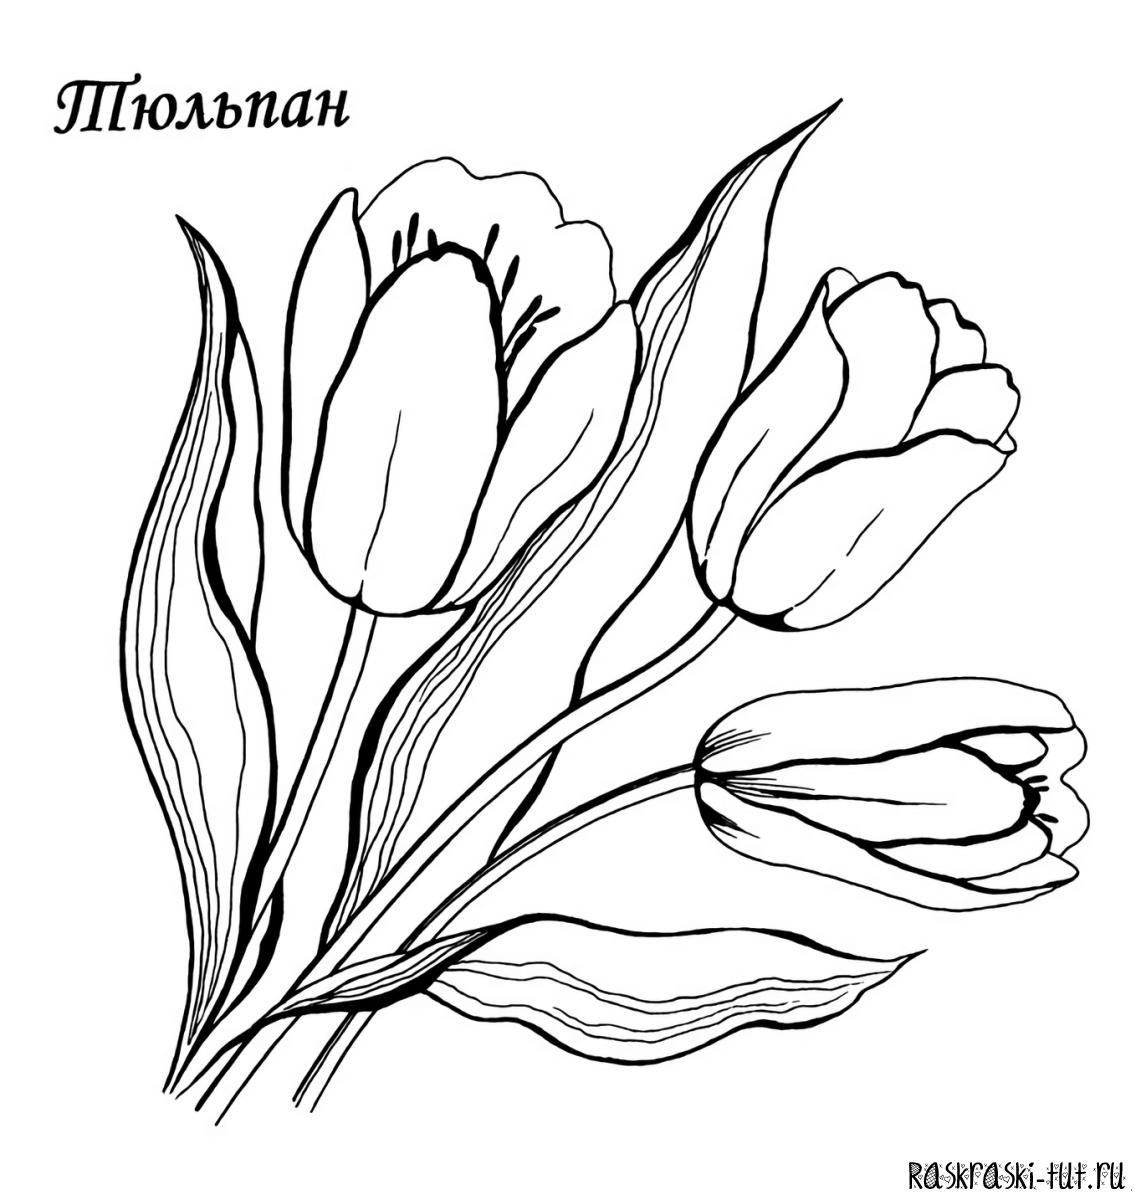 Раскраска с цветами онлайн бесплатно